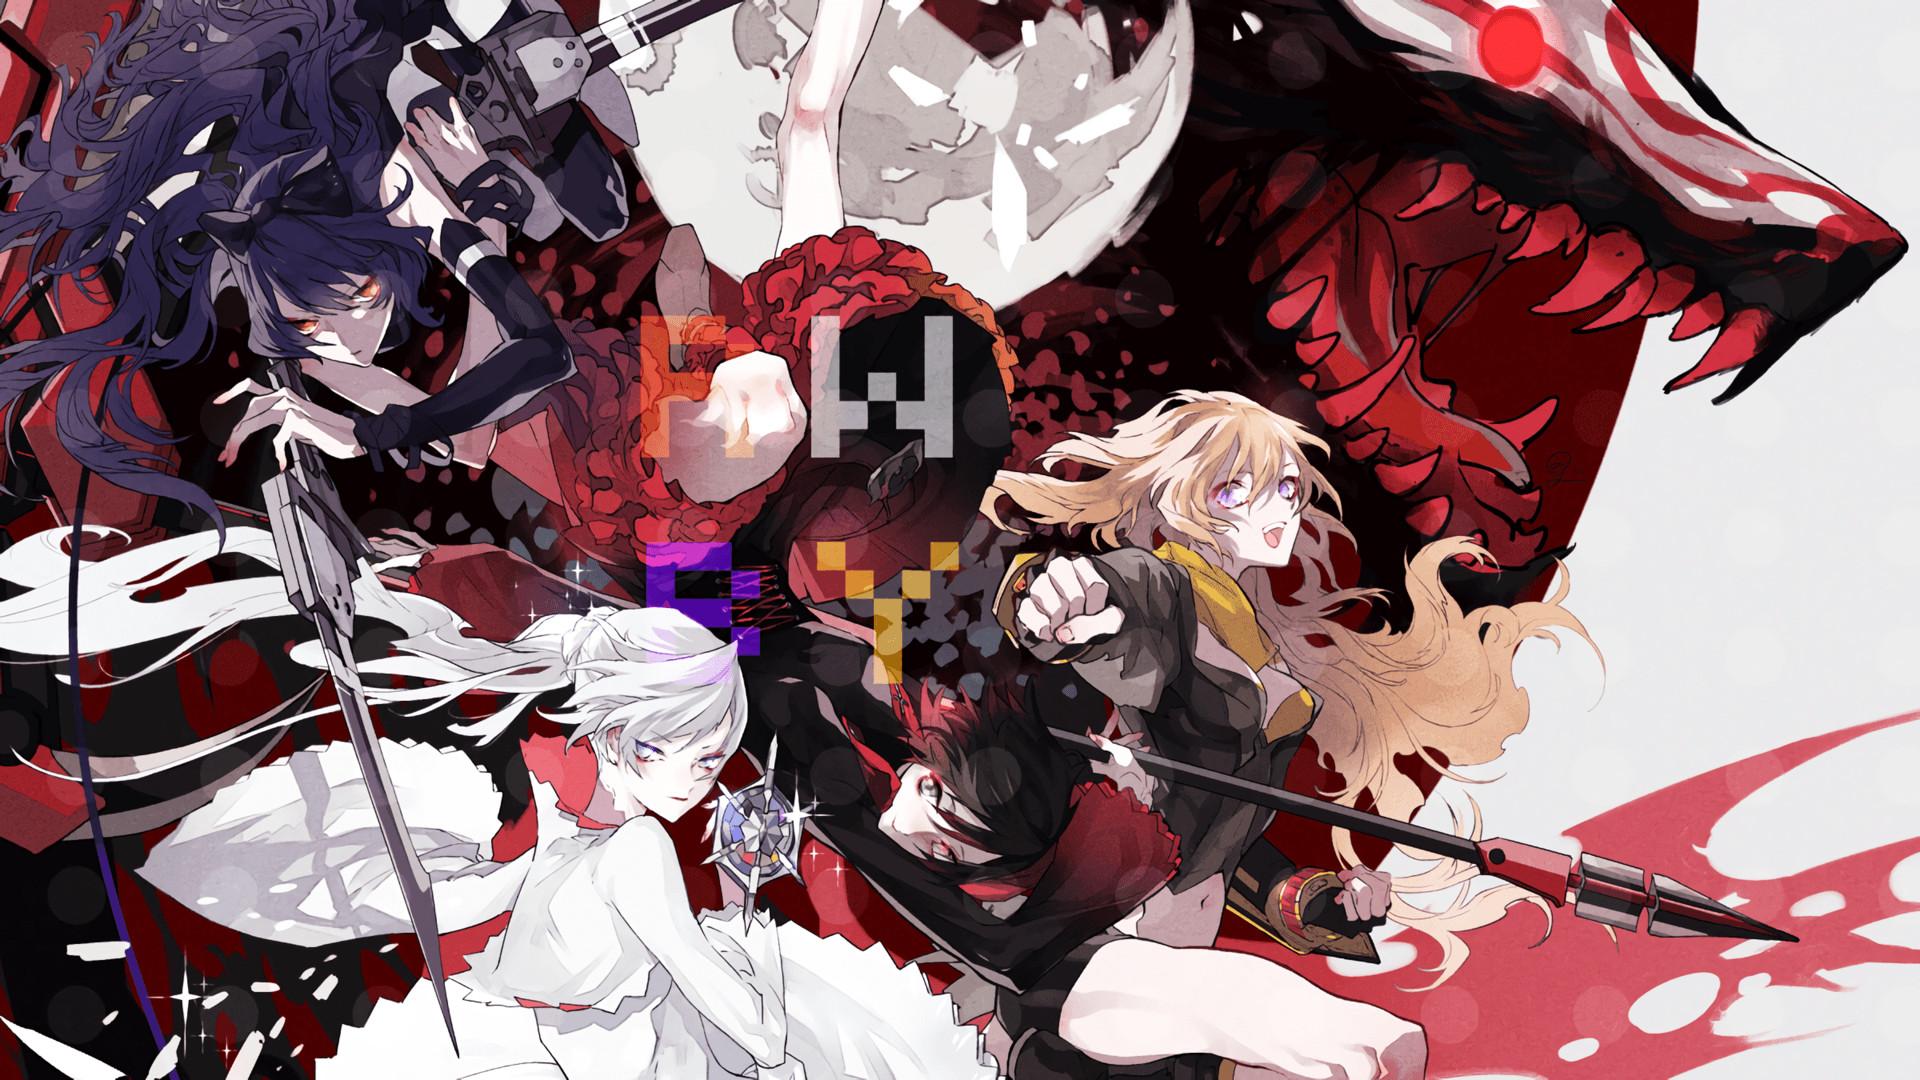 Anime <b>RWBY wallpapers</b> (<b>Desktop<